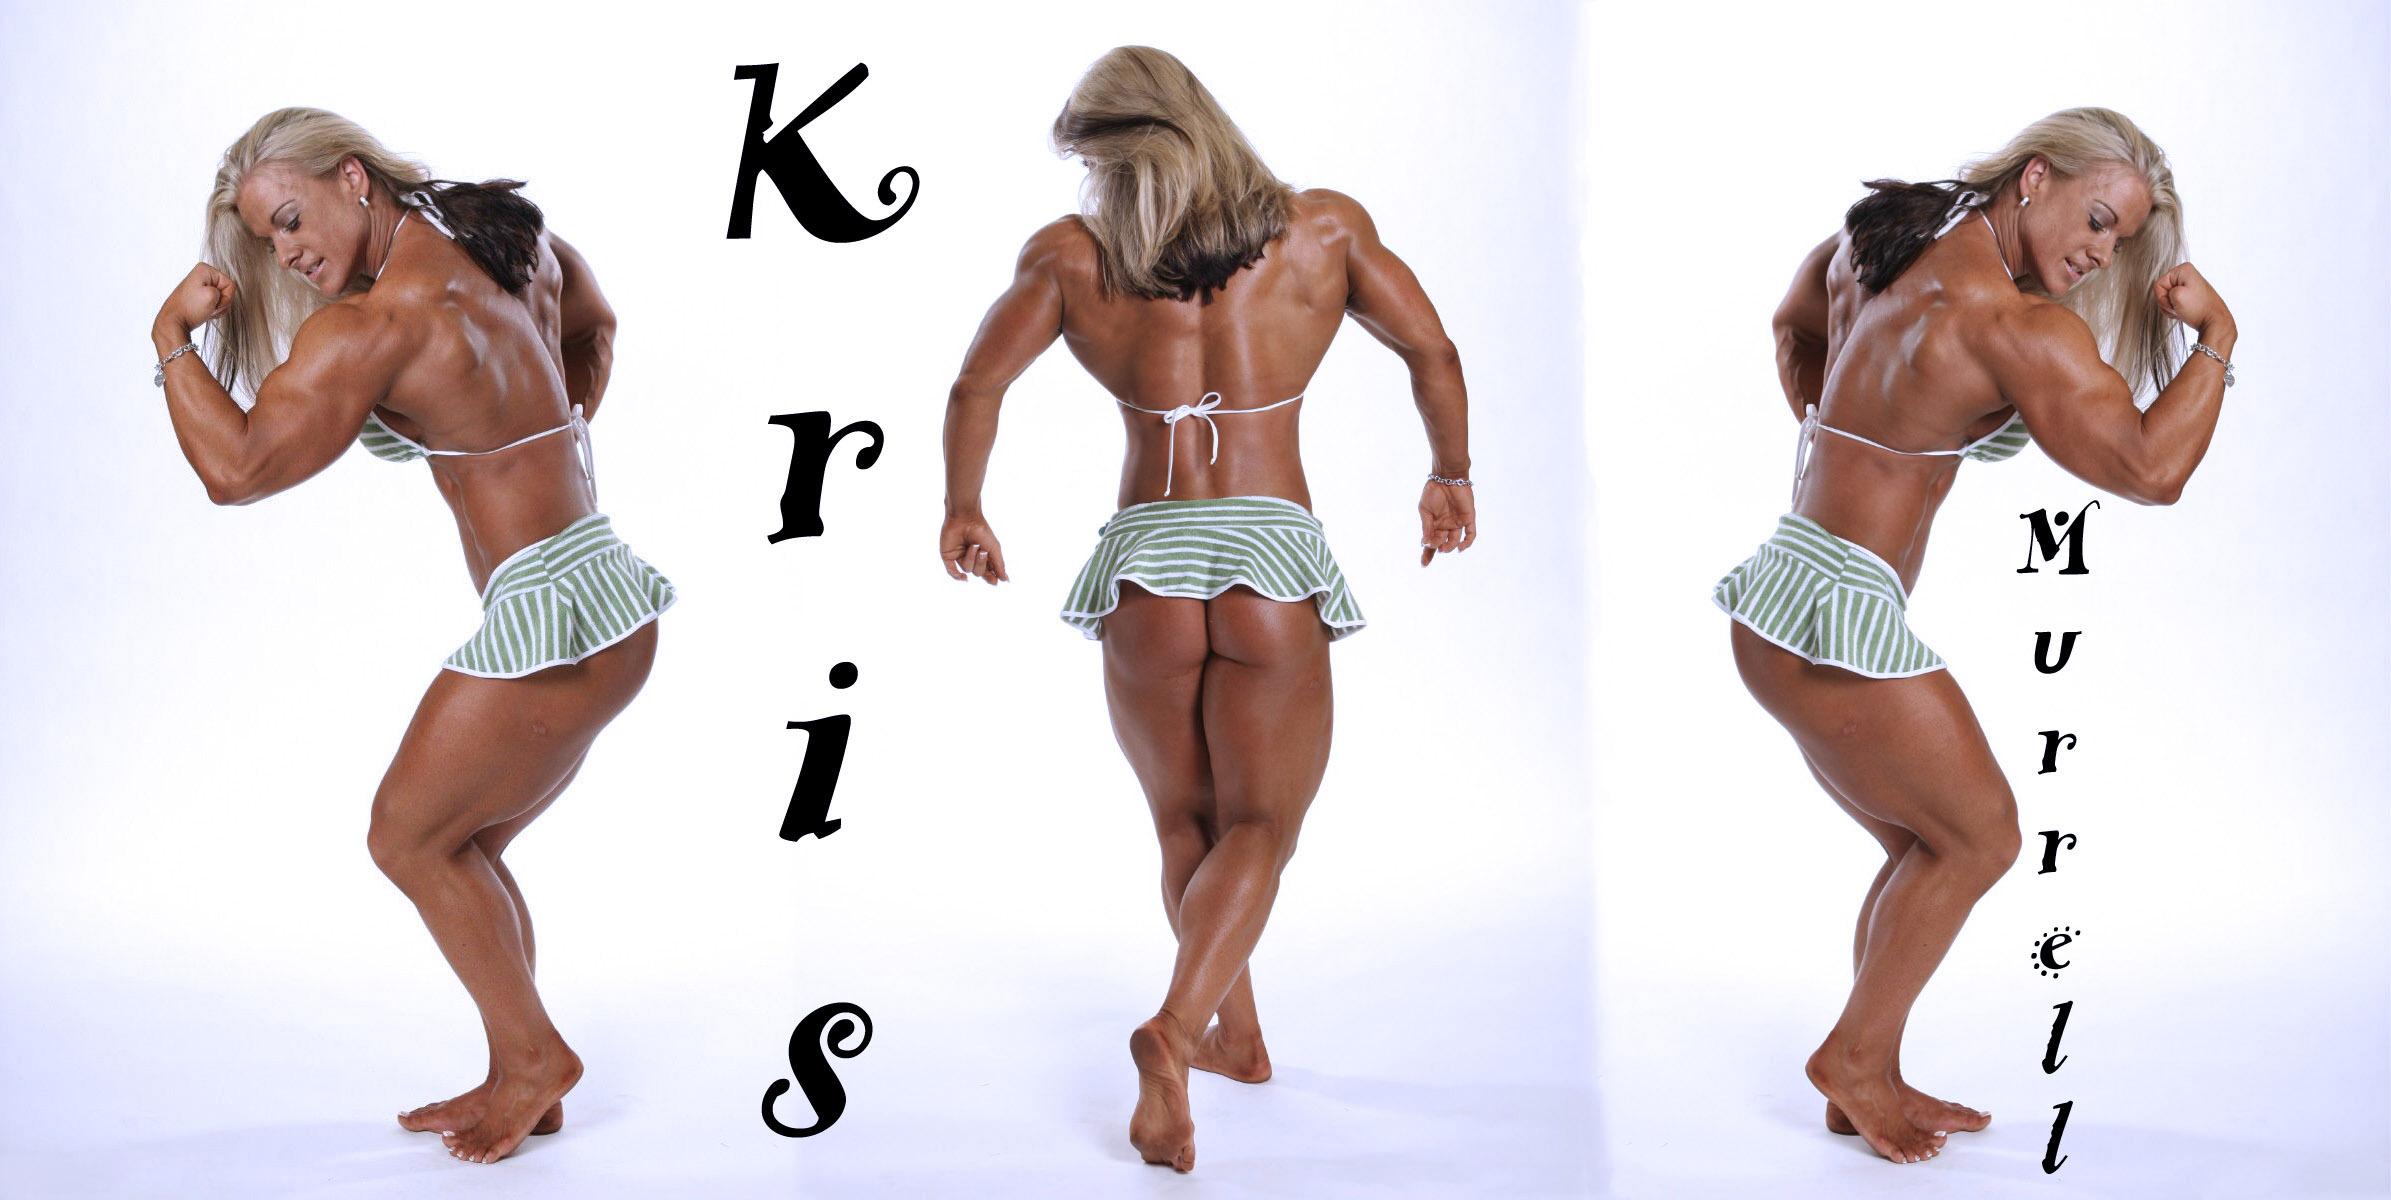 Kris Murrell Nude Photos 72